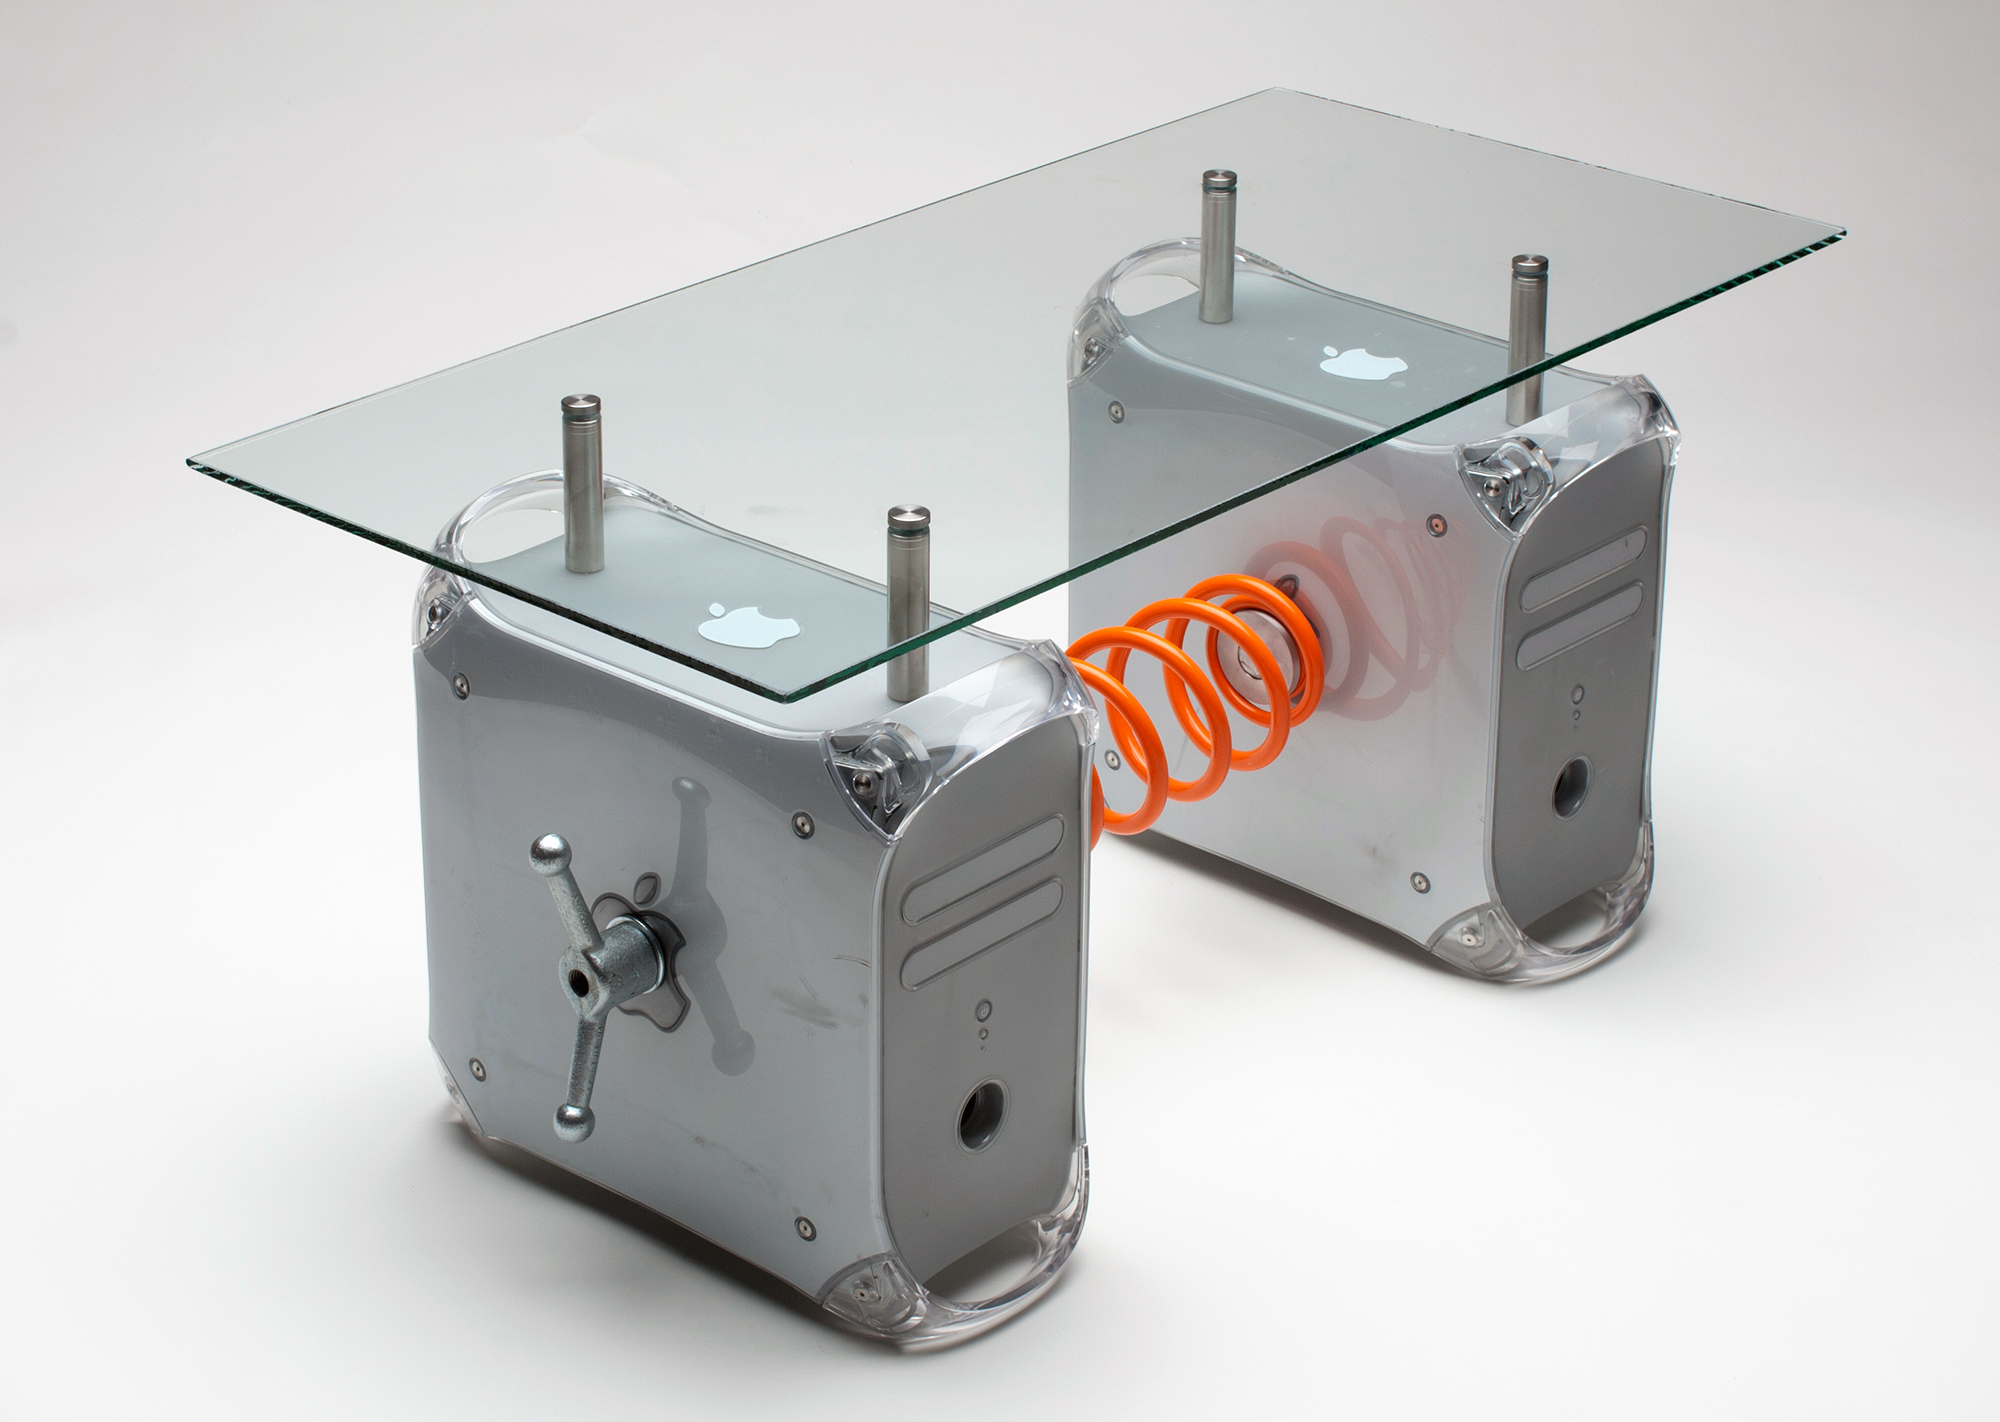 Mesa de centro com Power Mac G4 Quicksilver